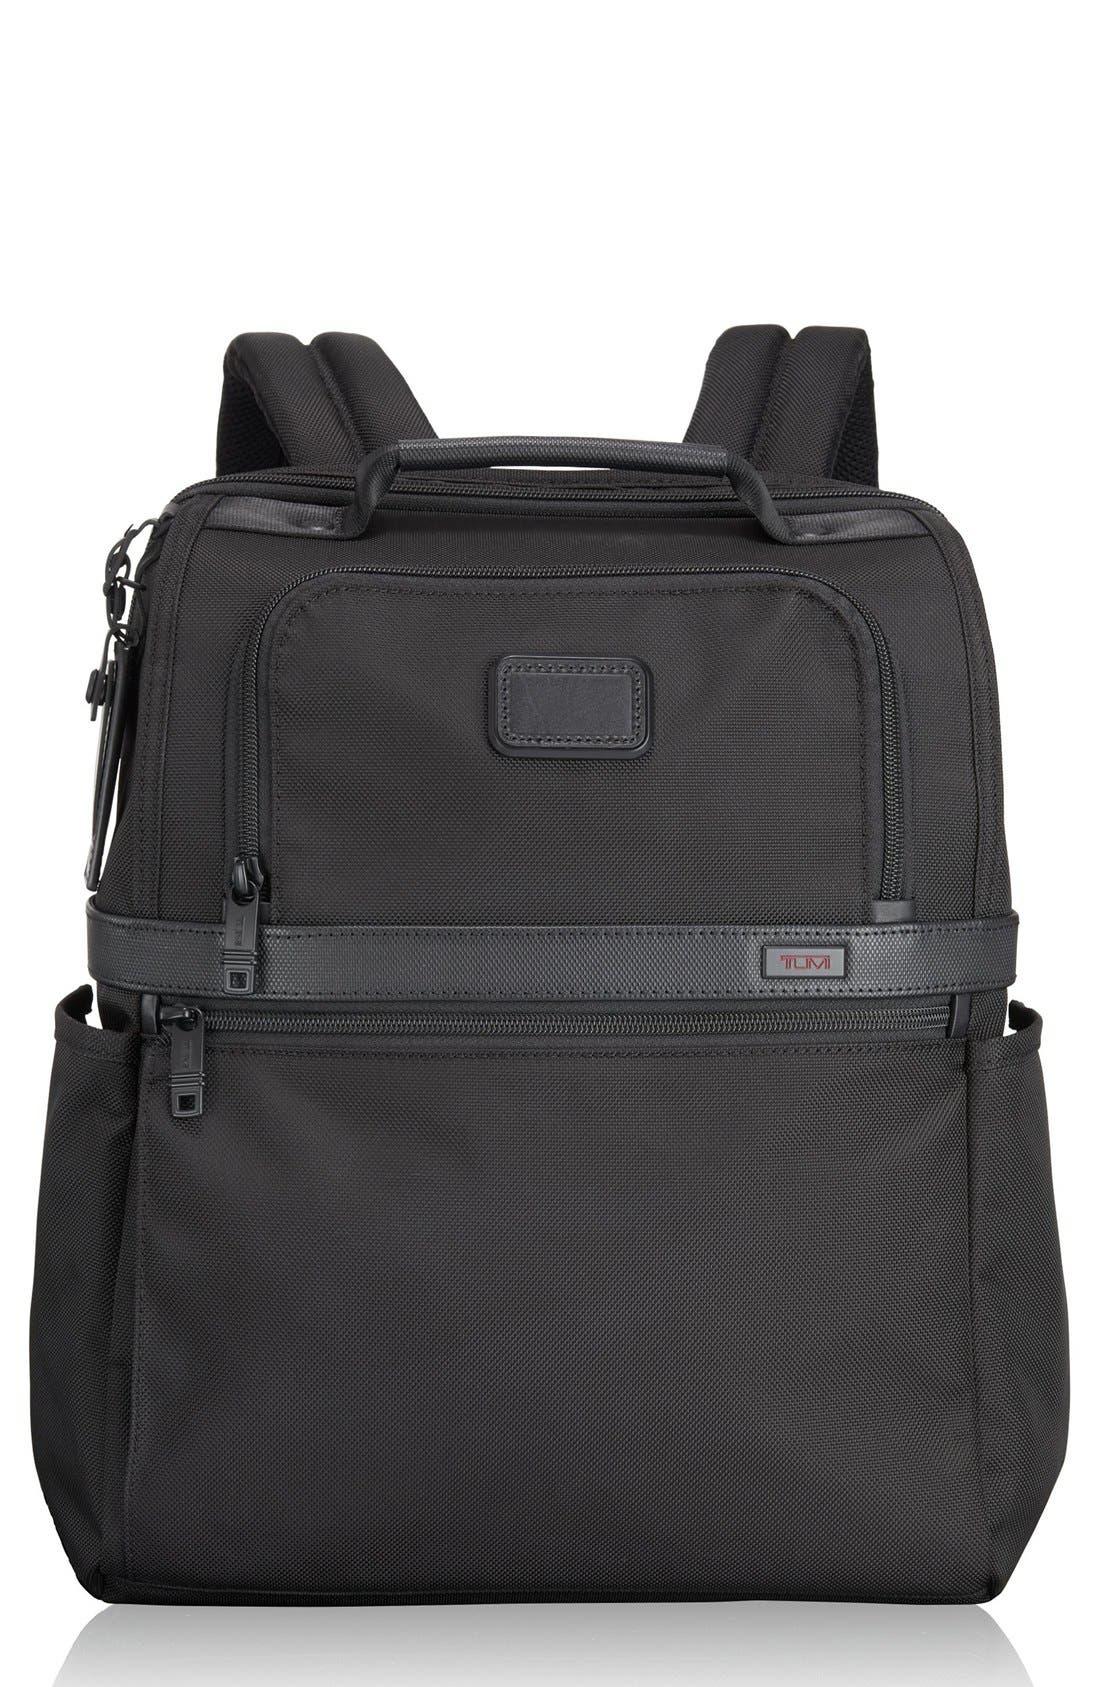 Slim Solutions Briefpack,                             Main thumbnail 1, color,                             BLACK